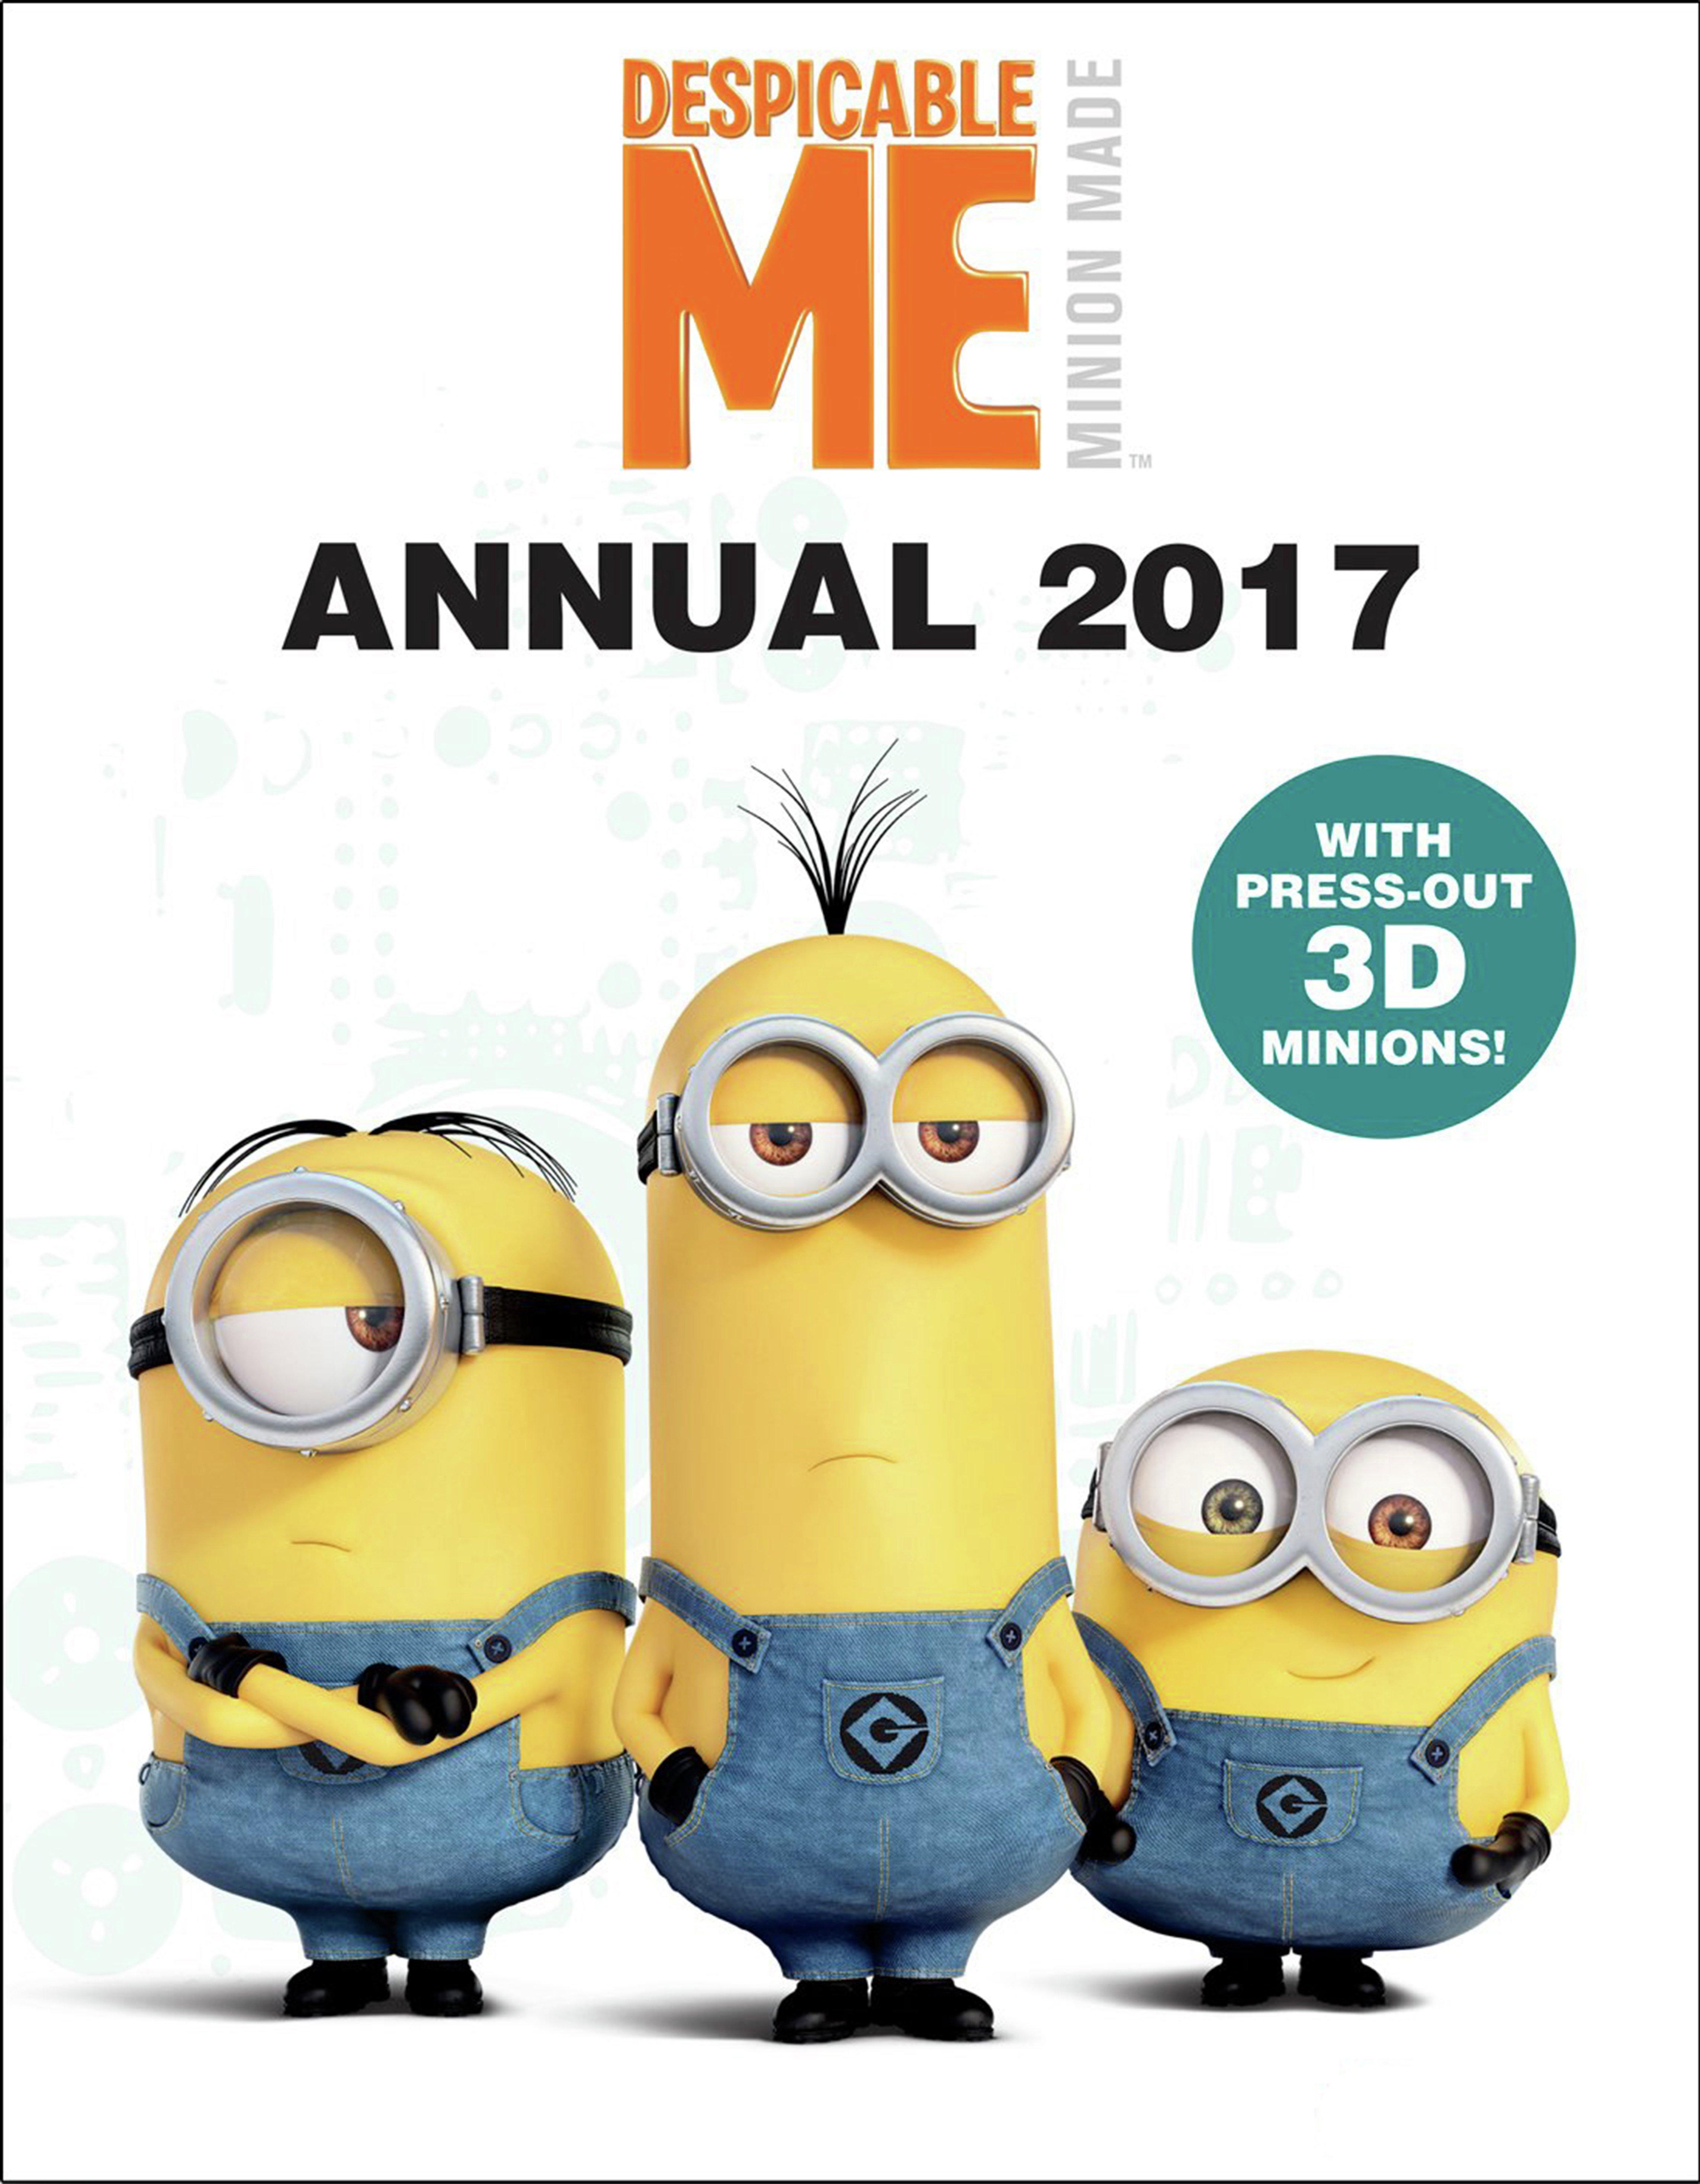 2017 Annual Despicable Me.